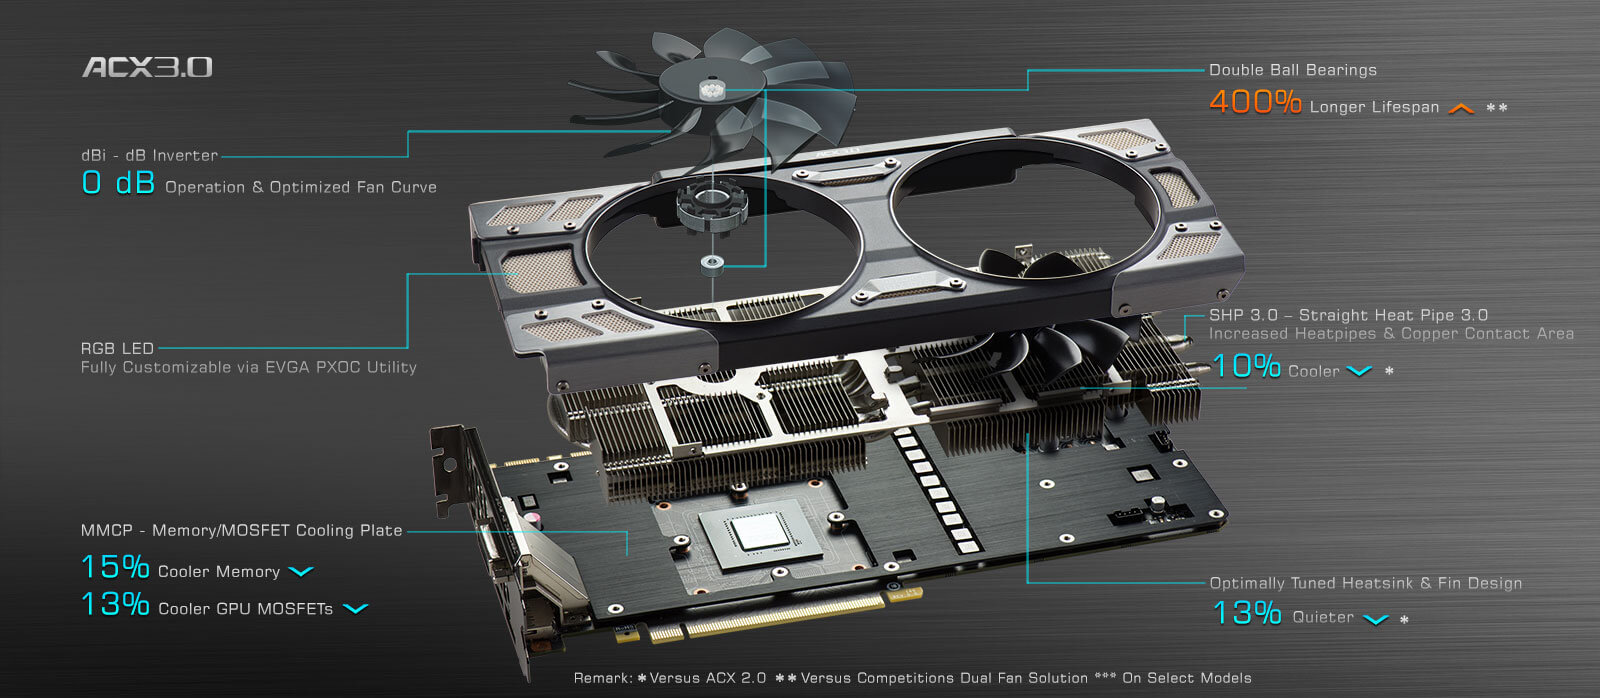 EVGA GTX 1070 SC Review & Overclocking Benchmarks | GamersNexus